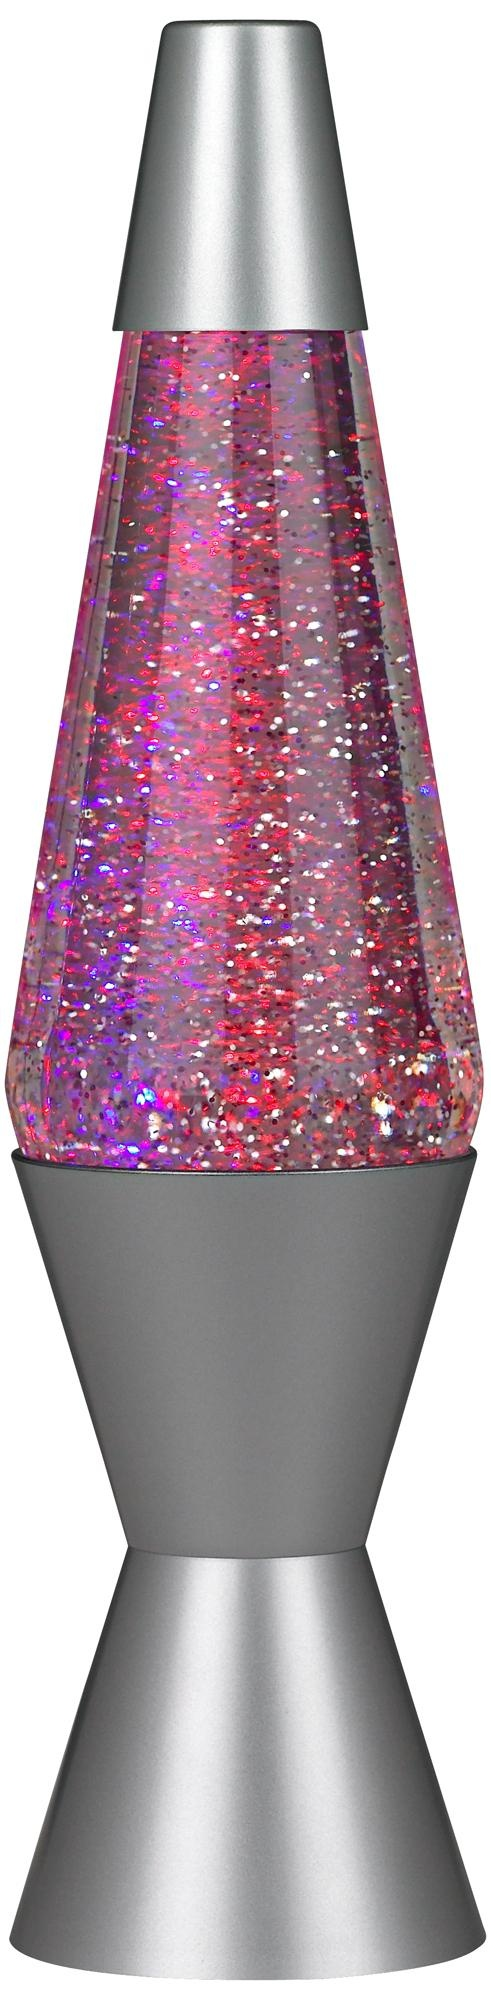 Zebra lava lamp uk - Color Phasing Vortex Motorized Glitter Lava Lamp